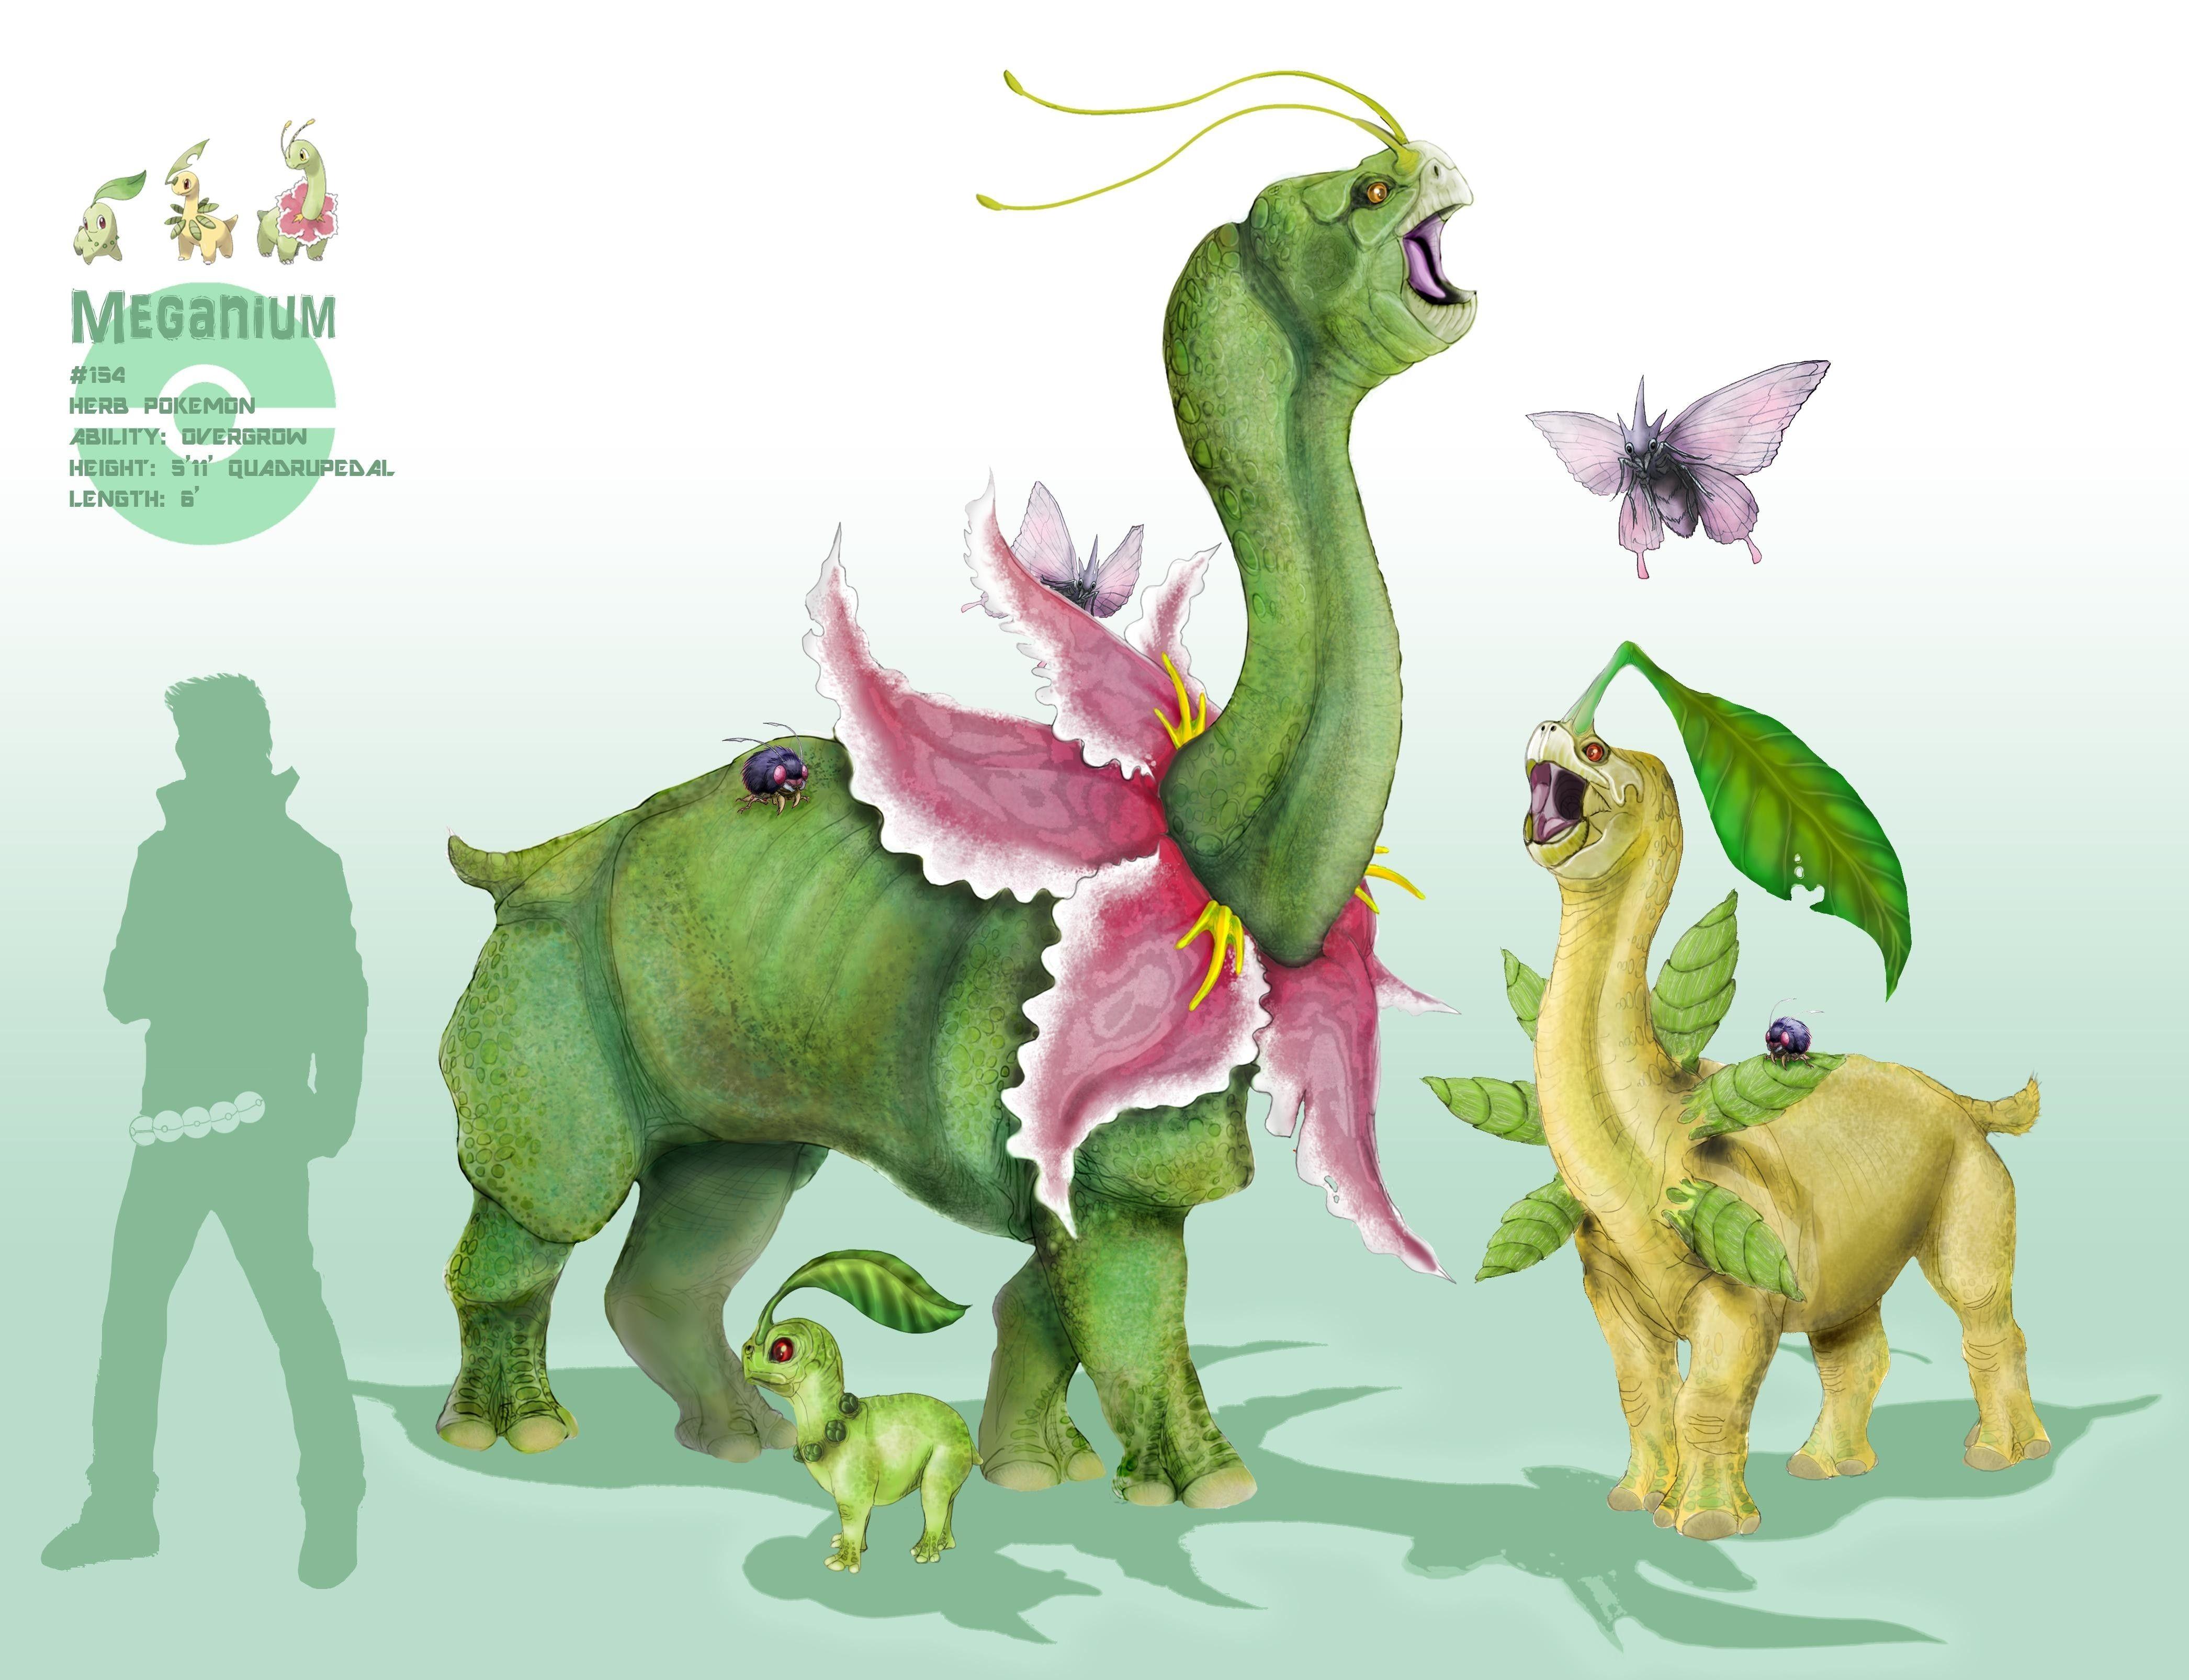 Nintendo pokemon digital art artwork venonat chikorita meganium 4184x3212